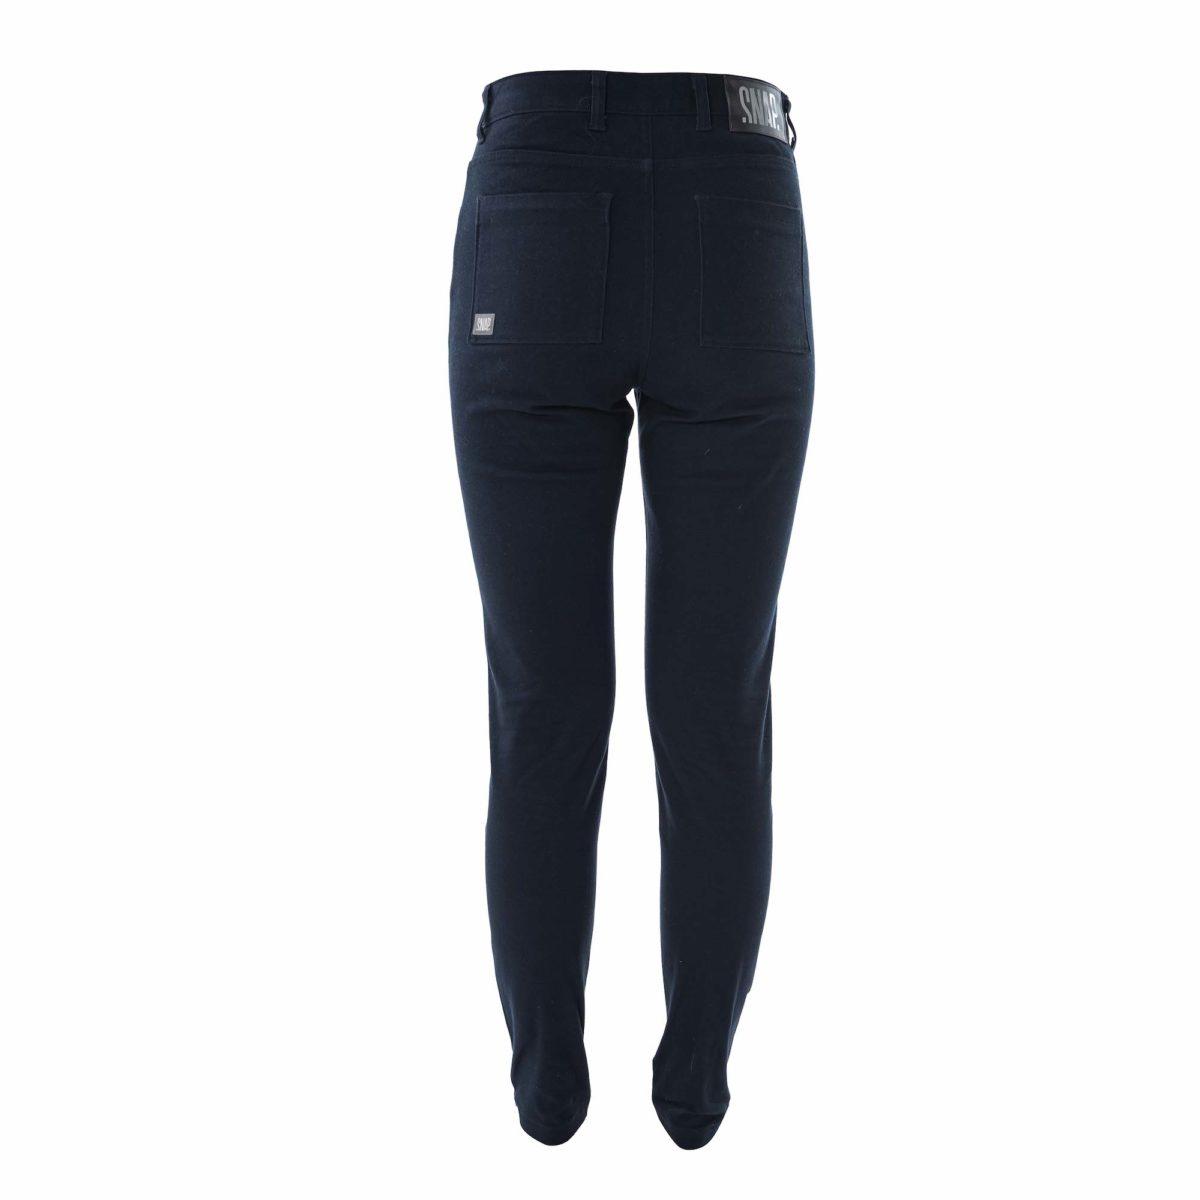 dark blue pants for woman